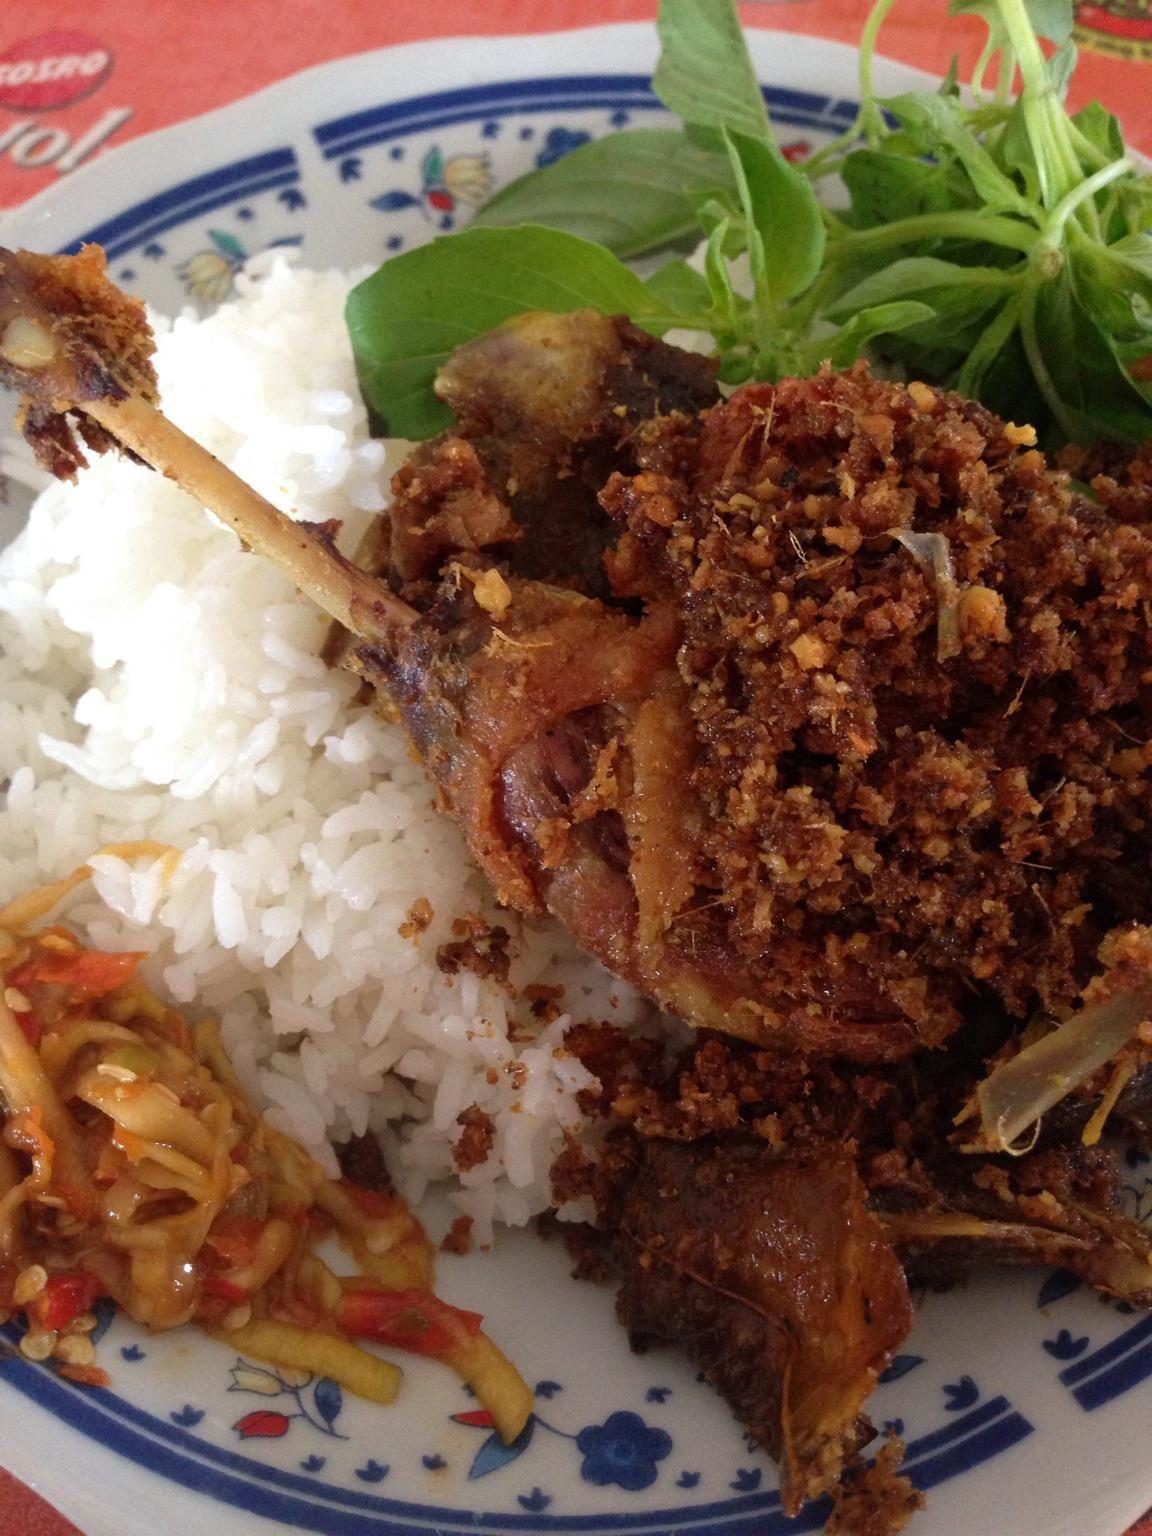 Resep Bebek Sinjay : resep, bebek, sinjay, Bebek, Sinjay, (Crispy, Fried, Duck)., Madura,, Indonesia, Masakan, Indonesia,, Resep, Masakan,